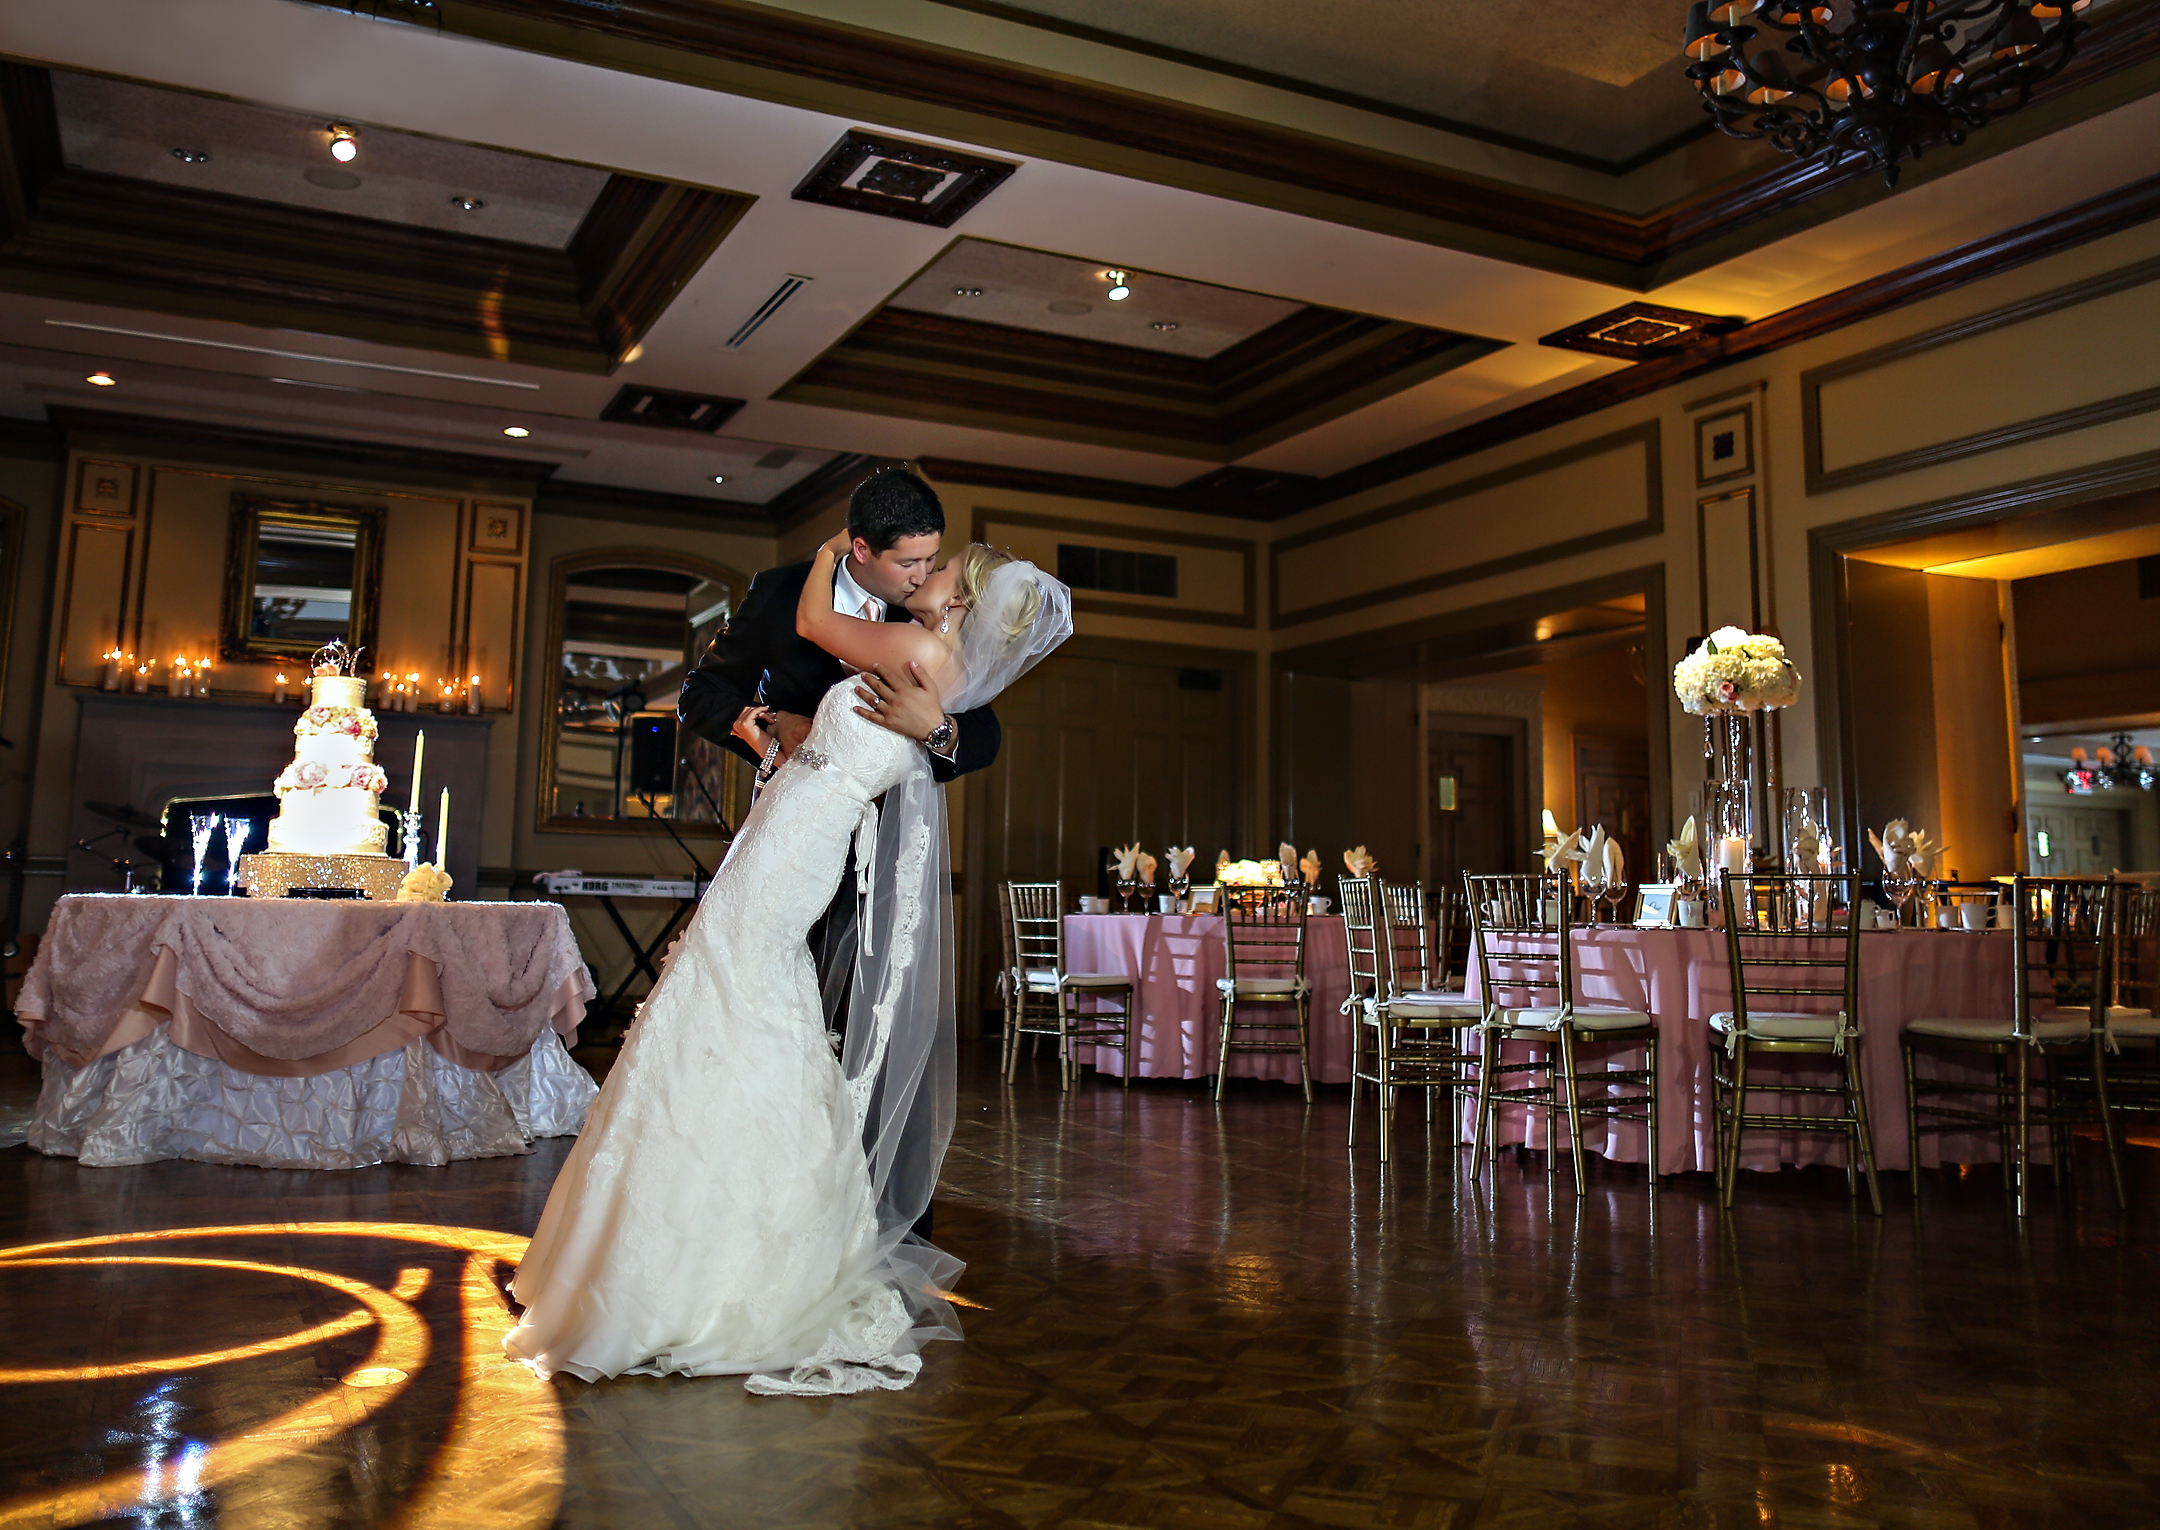 Wedding at Kenwood Country Club by Courtenay Lambert Florals (http://courtenaylambert.com).  Cincinnati Wedding flowers, destination wedding, florist, best florist, best flowers, Cincinnati event design, Pink and white wedding